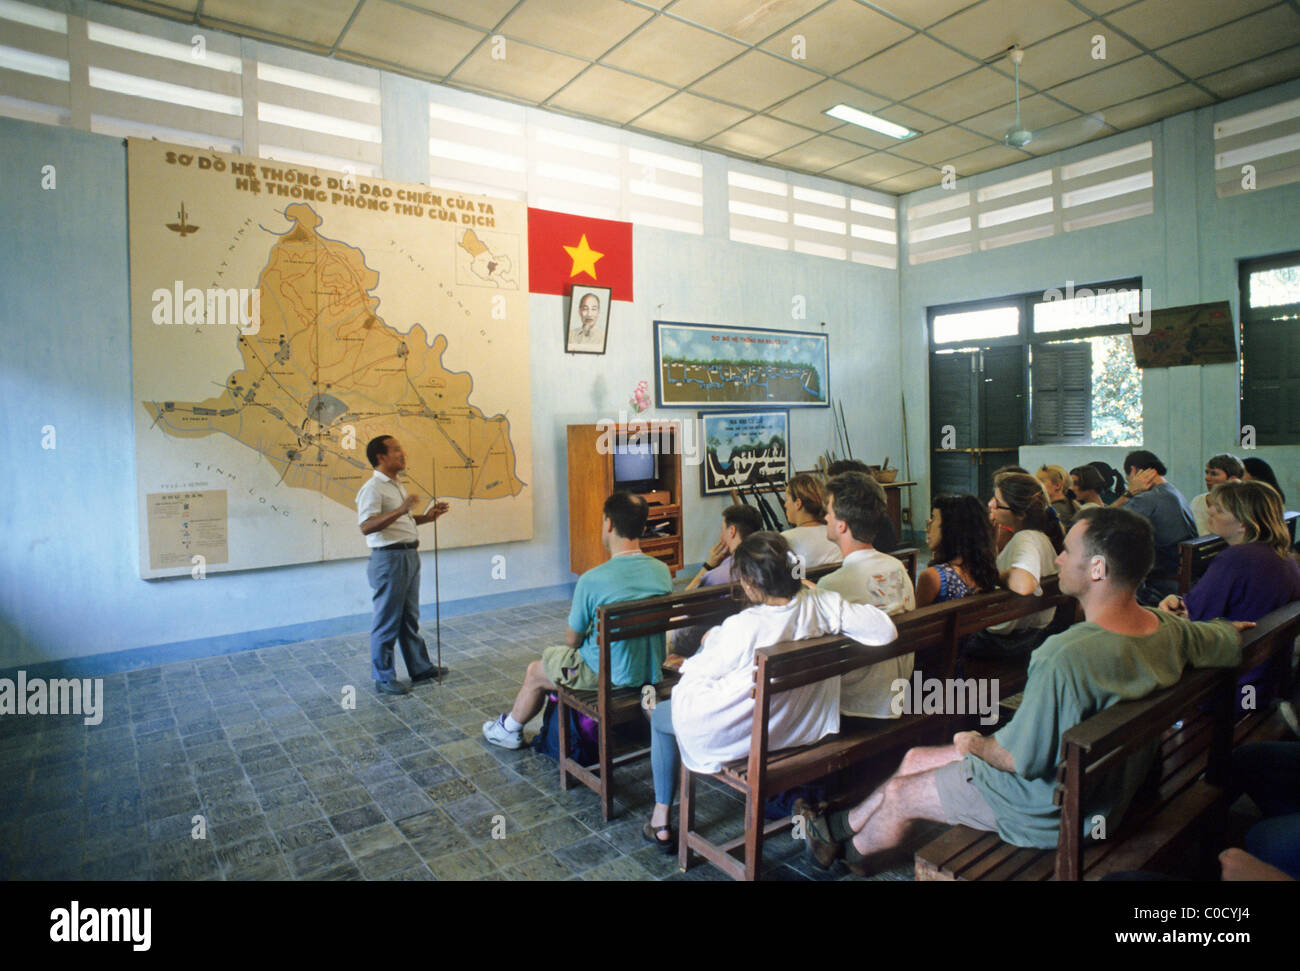 Elk134-3755 Vietnam, Cu Chi Tunnel (Vietcong nascondiglio), conferenza introduttiva per i visitatori Immagini Stock